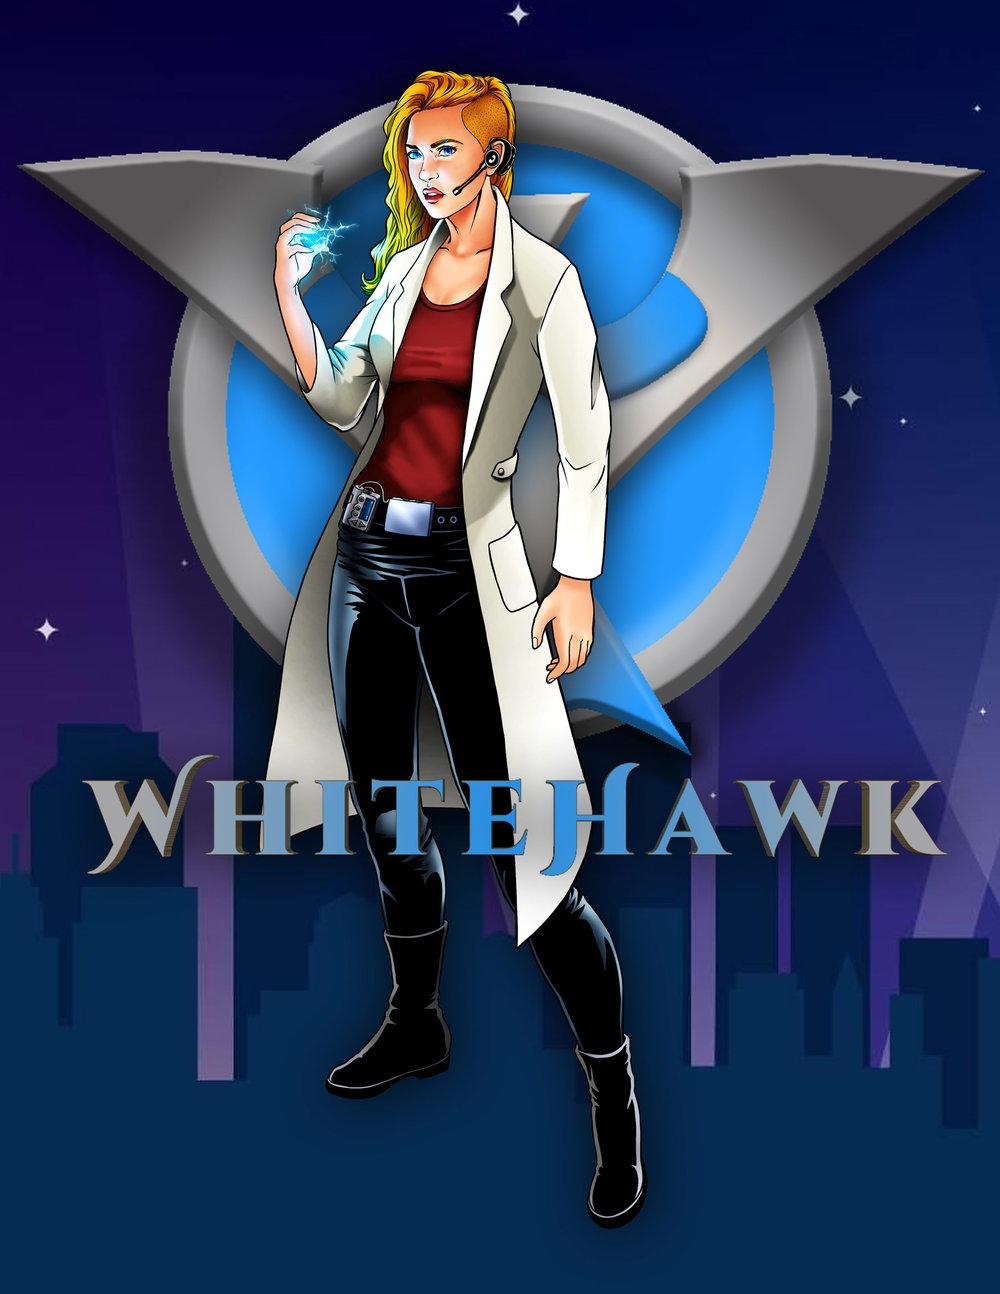 WhiteHawk Johanna